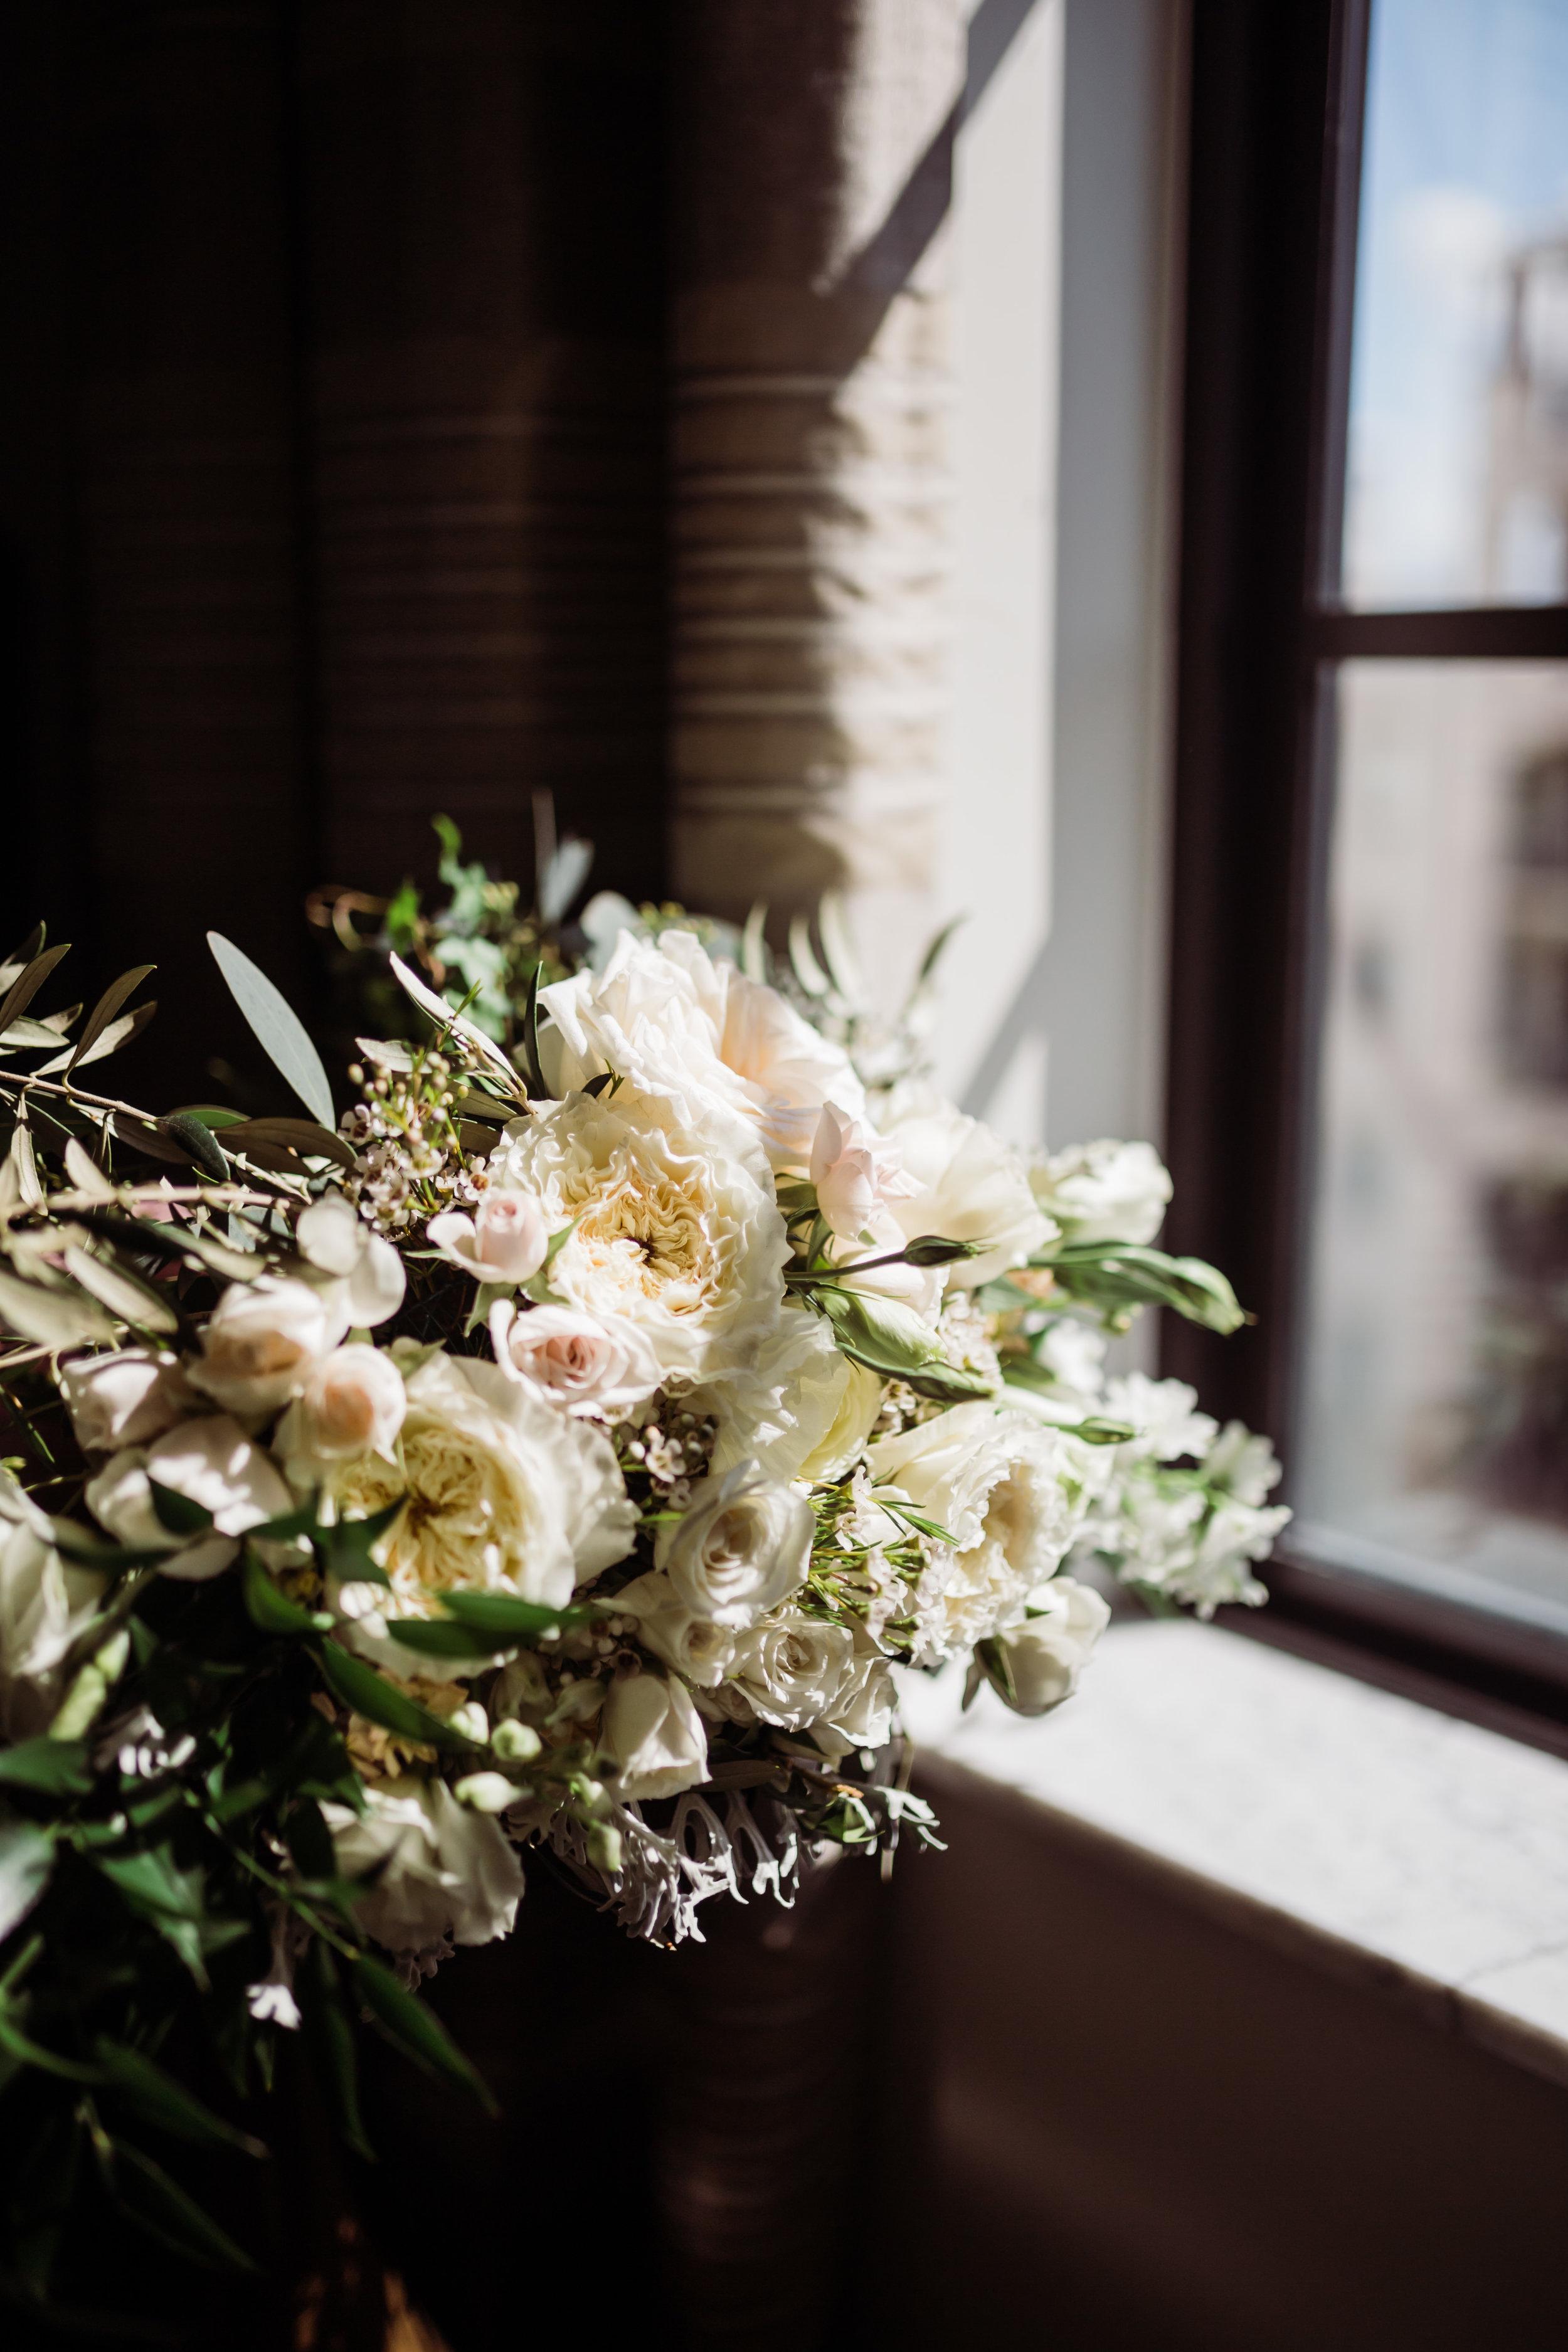 2017.10.15 Steffi and Elliott Simmonds Casa Feliz Wedding (30 of 969).jpg